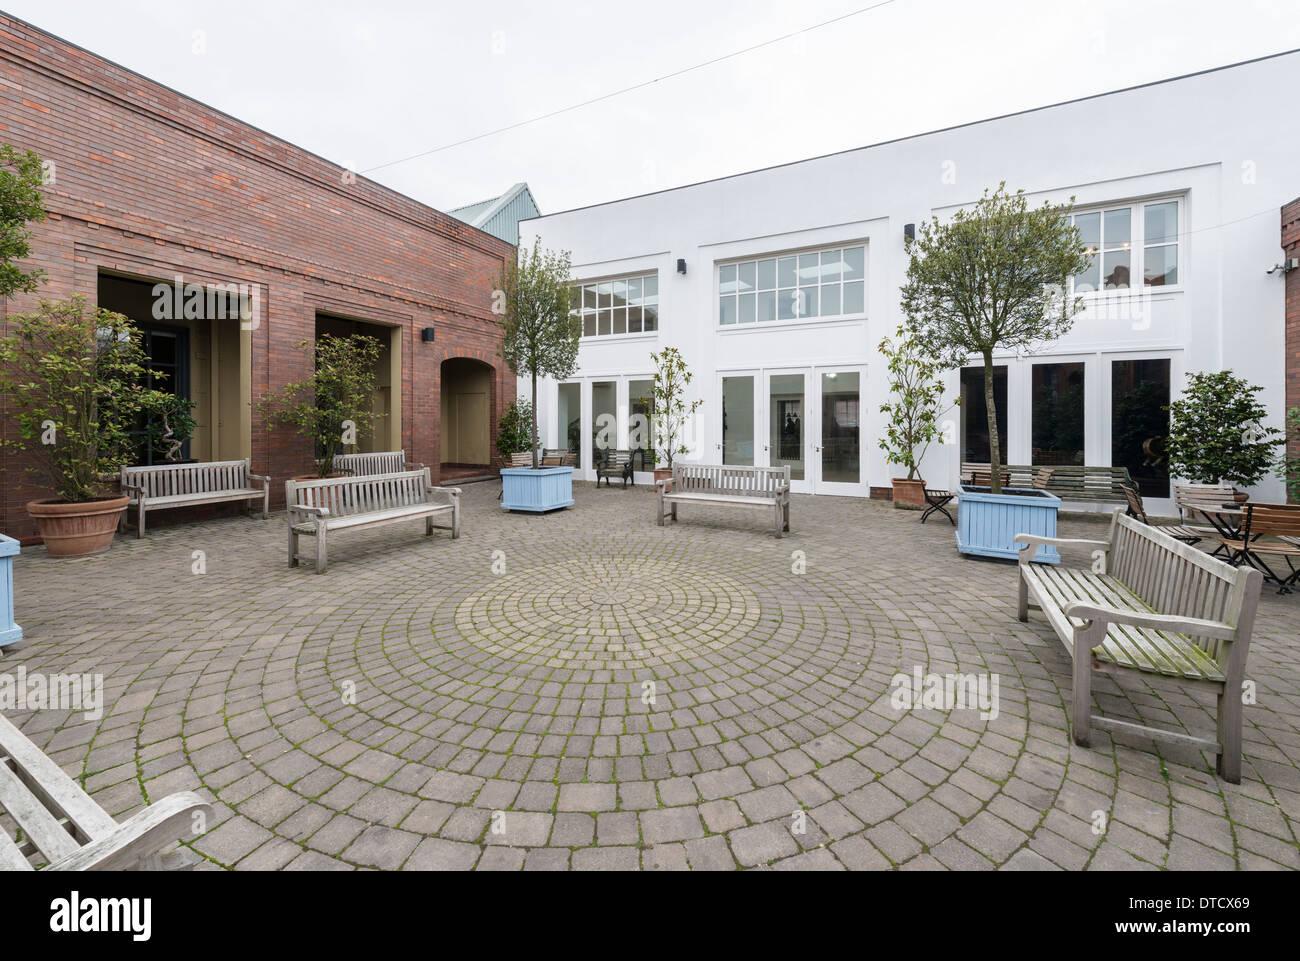 Fazeley Studios, Digbeth, Birmingham, England. - Stock Image